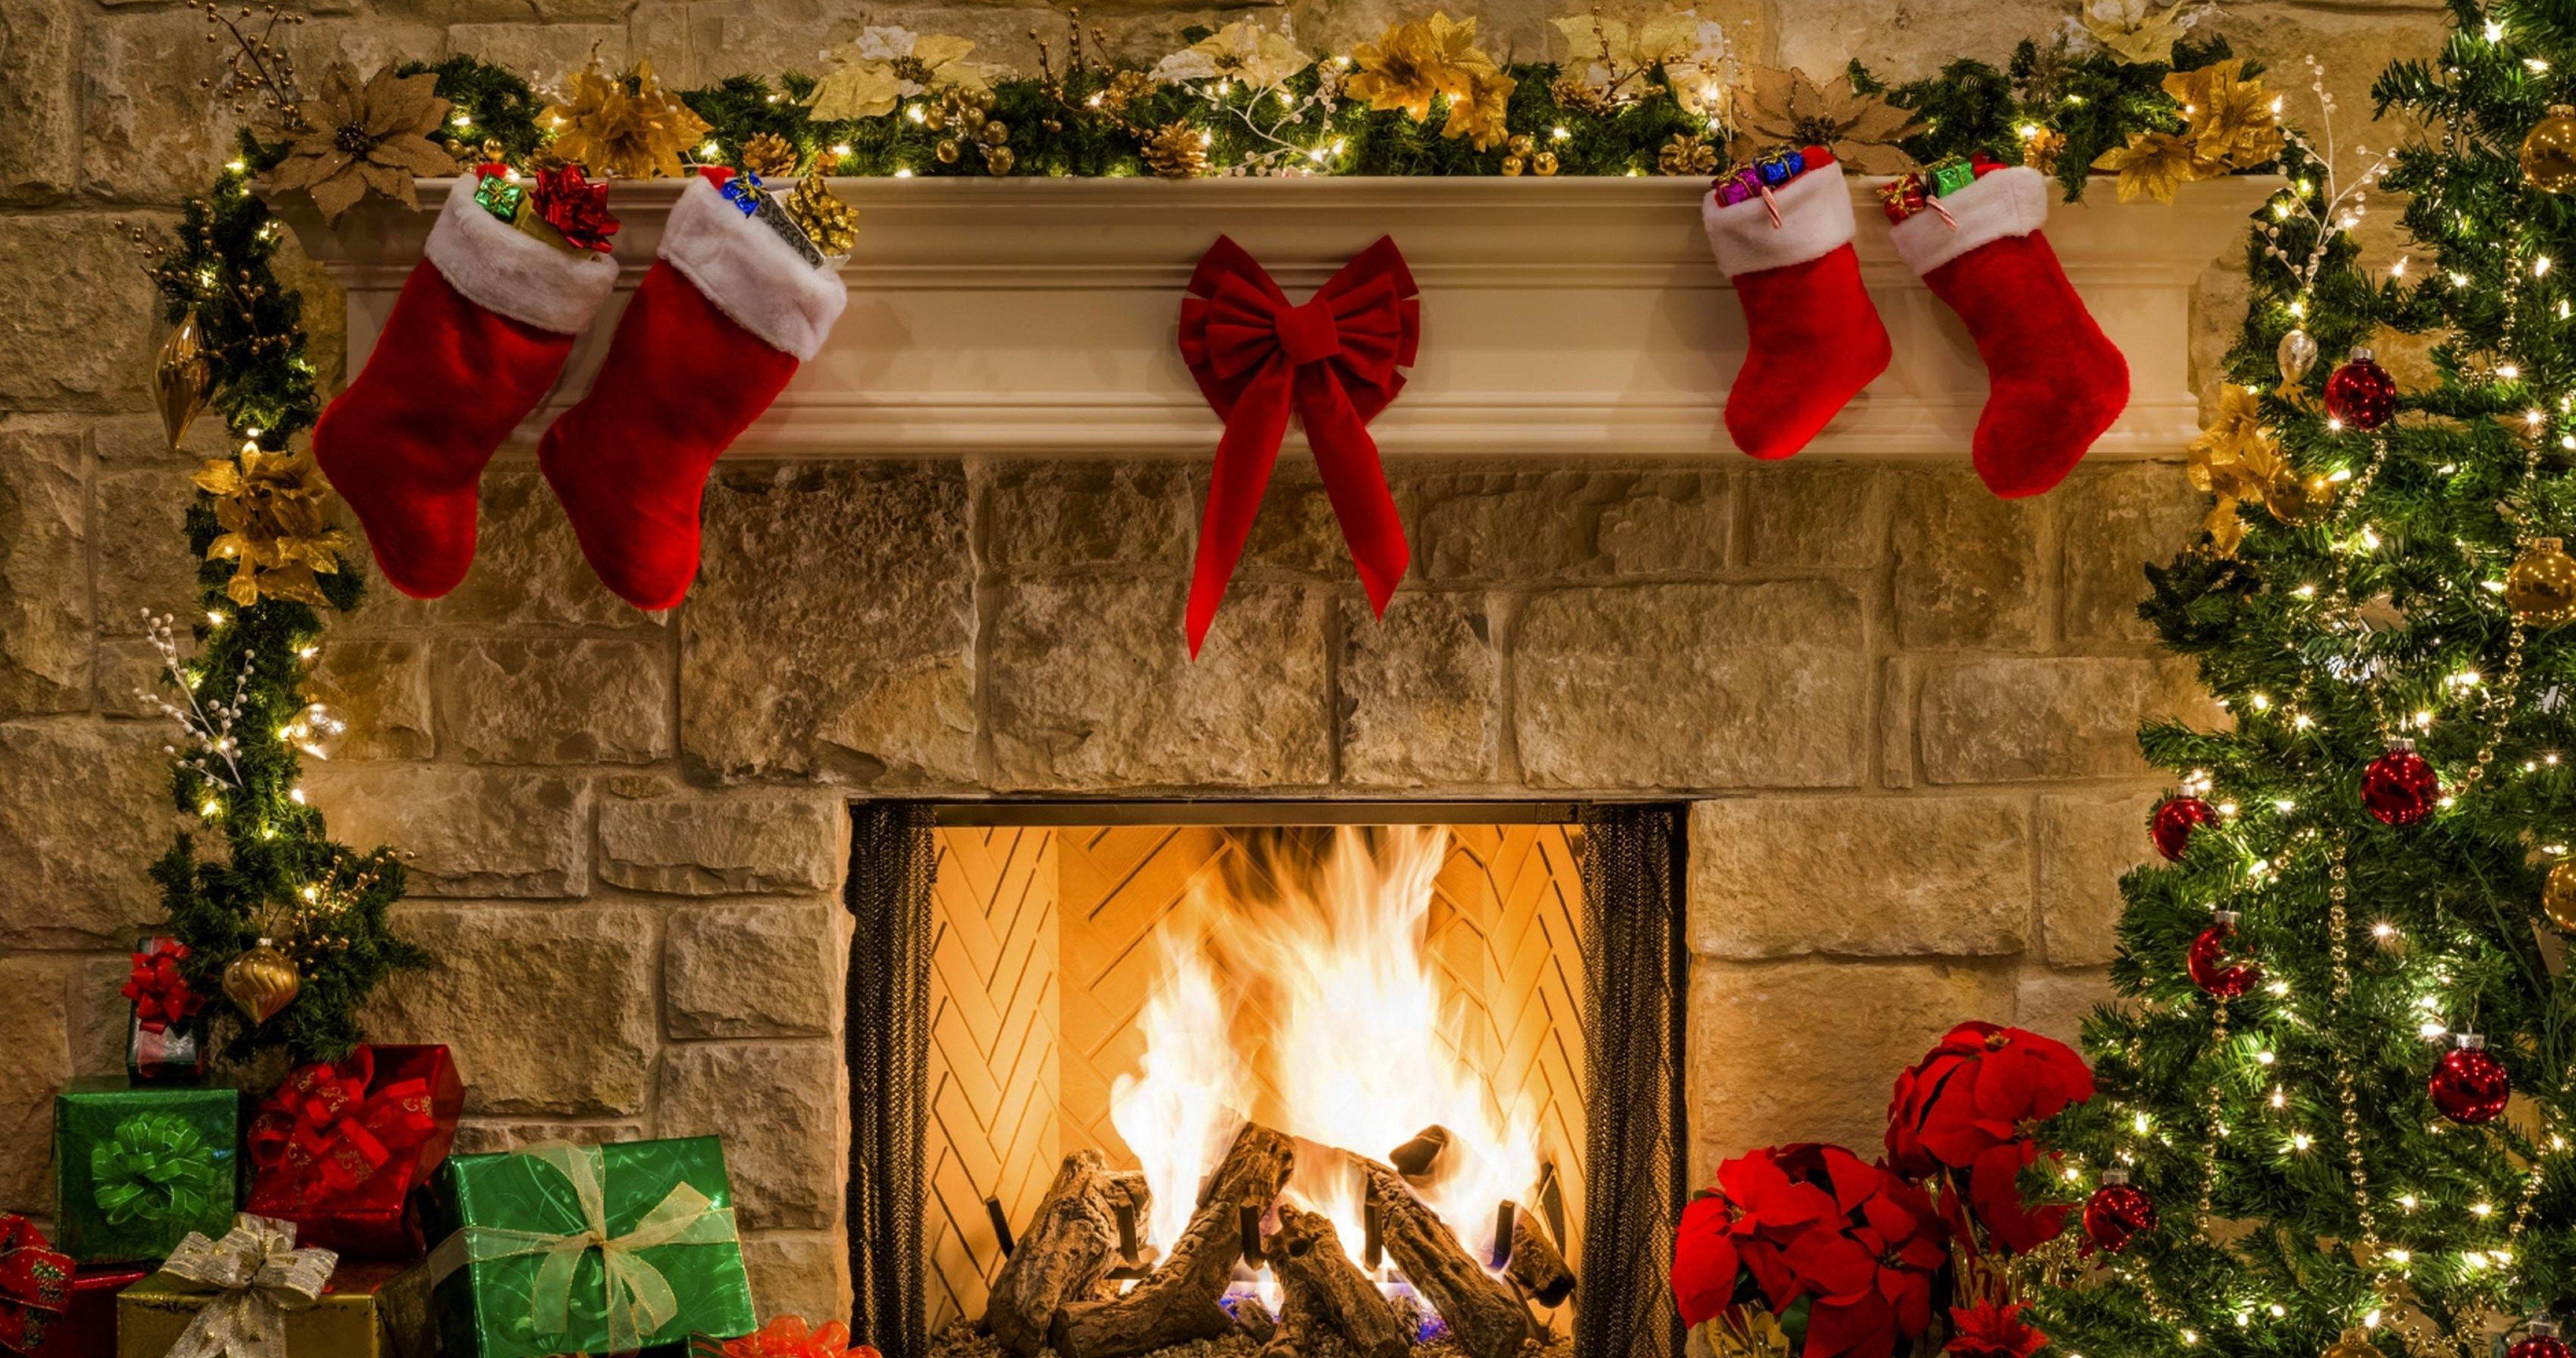 Christmas Fireplace Wallpapers   Top Christmas Fireplace 4096x2160